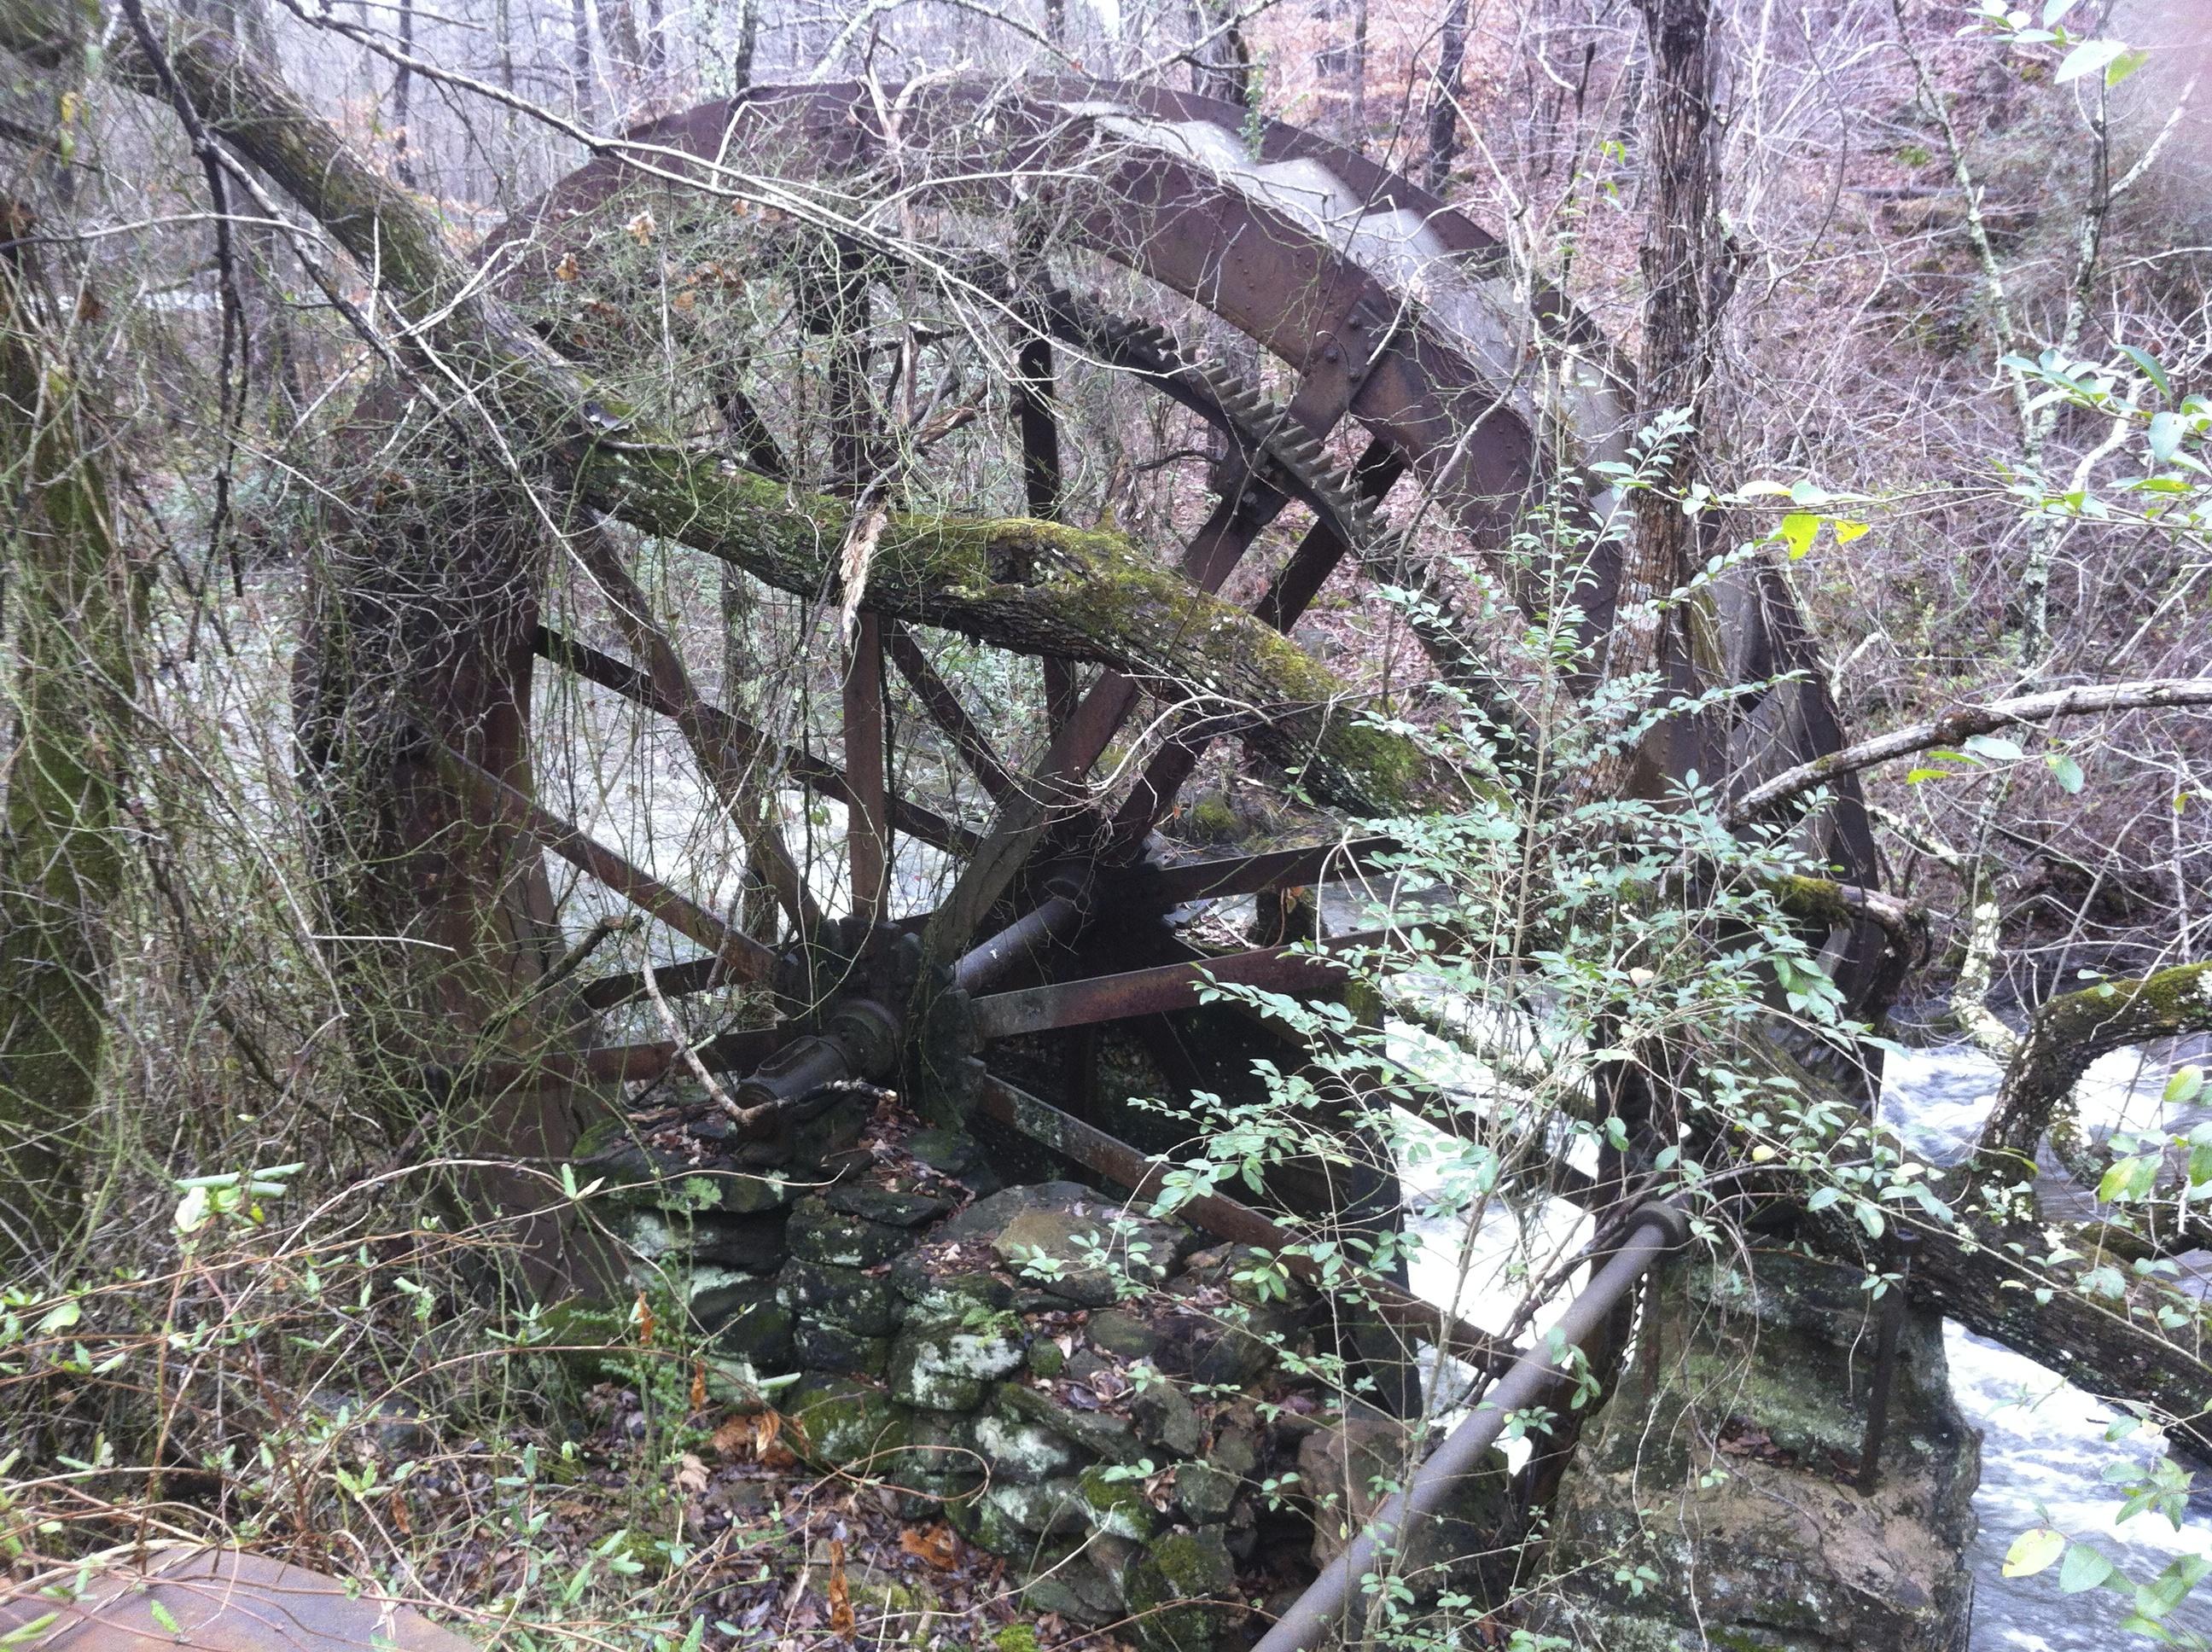 Late 19th century water wheel